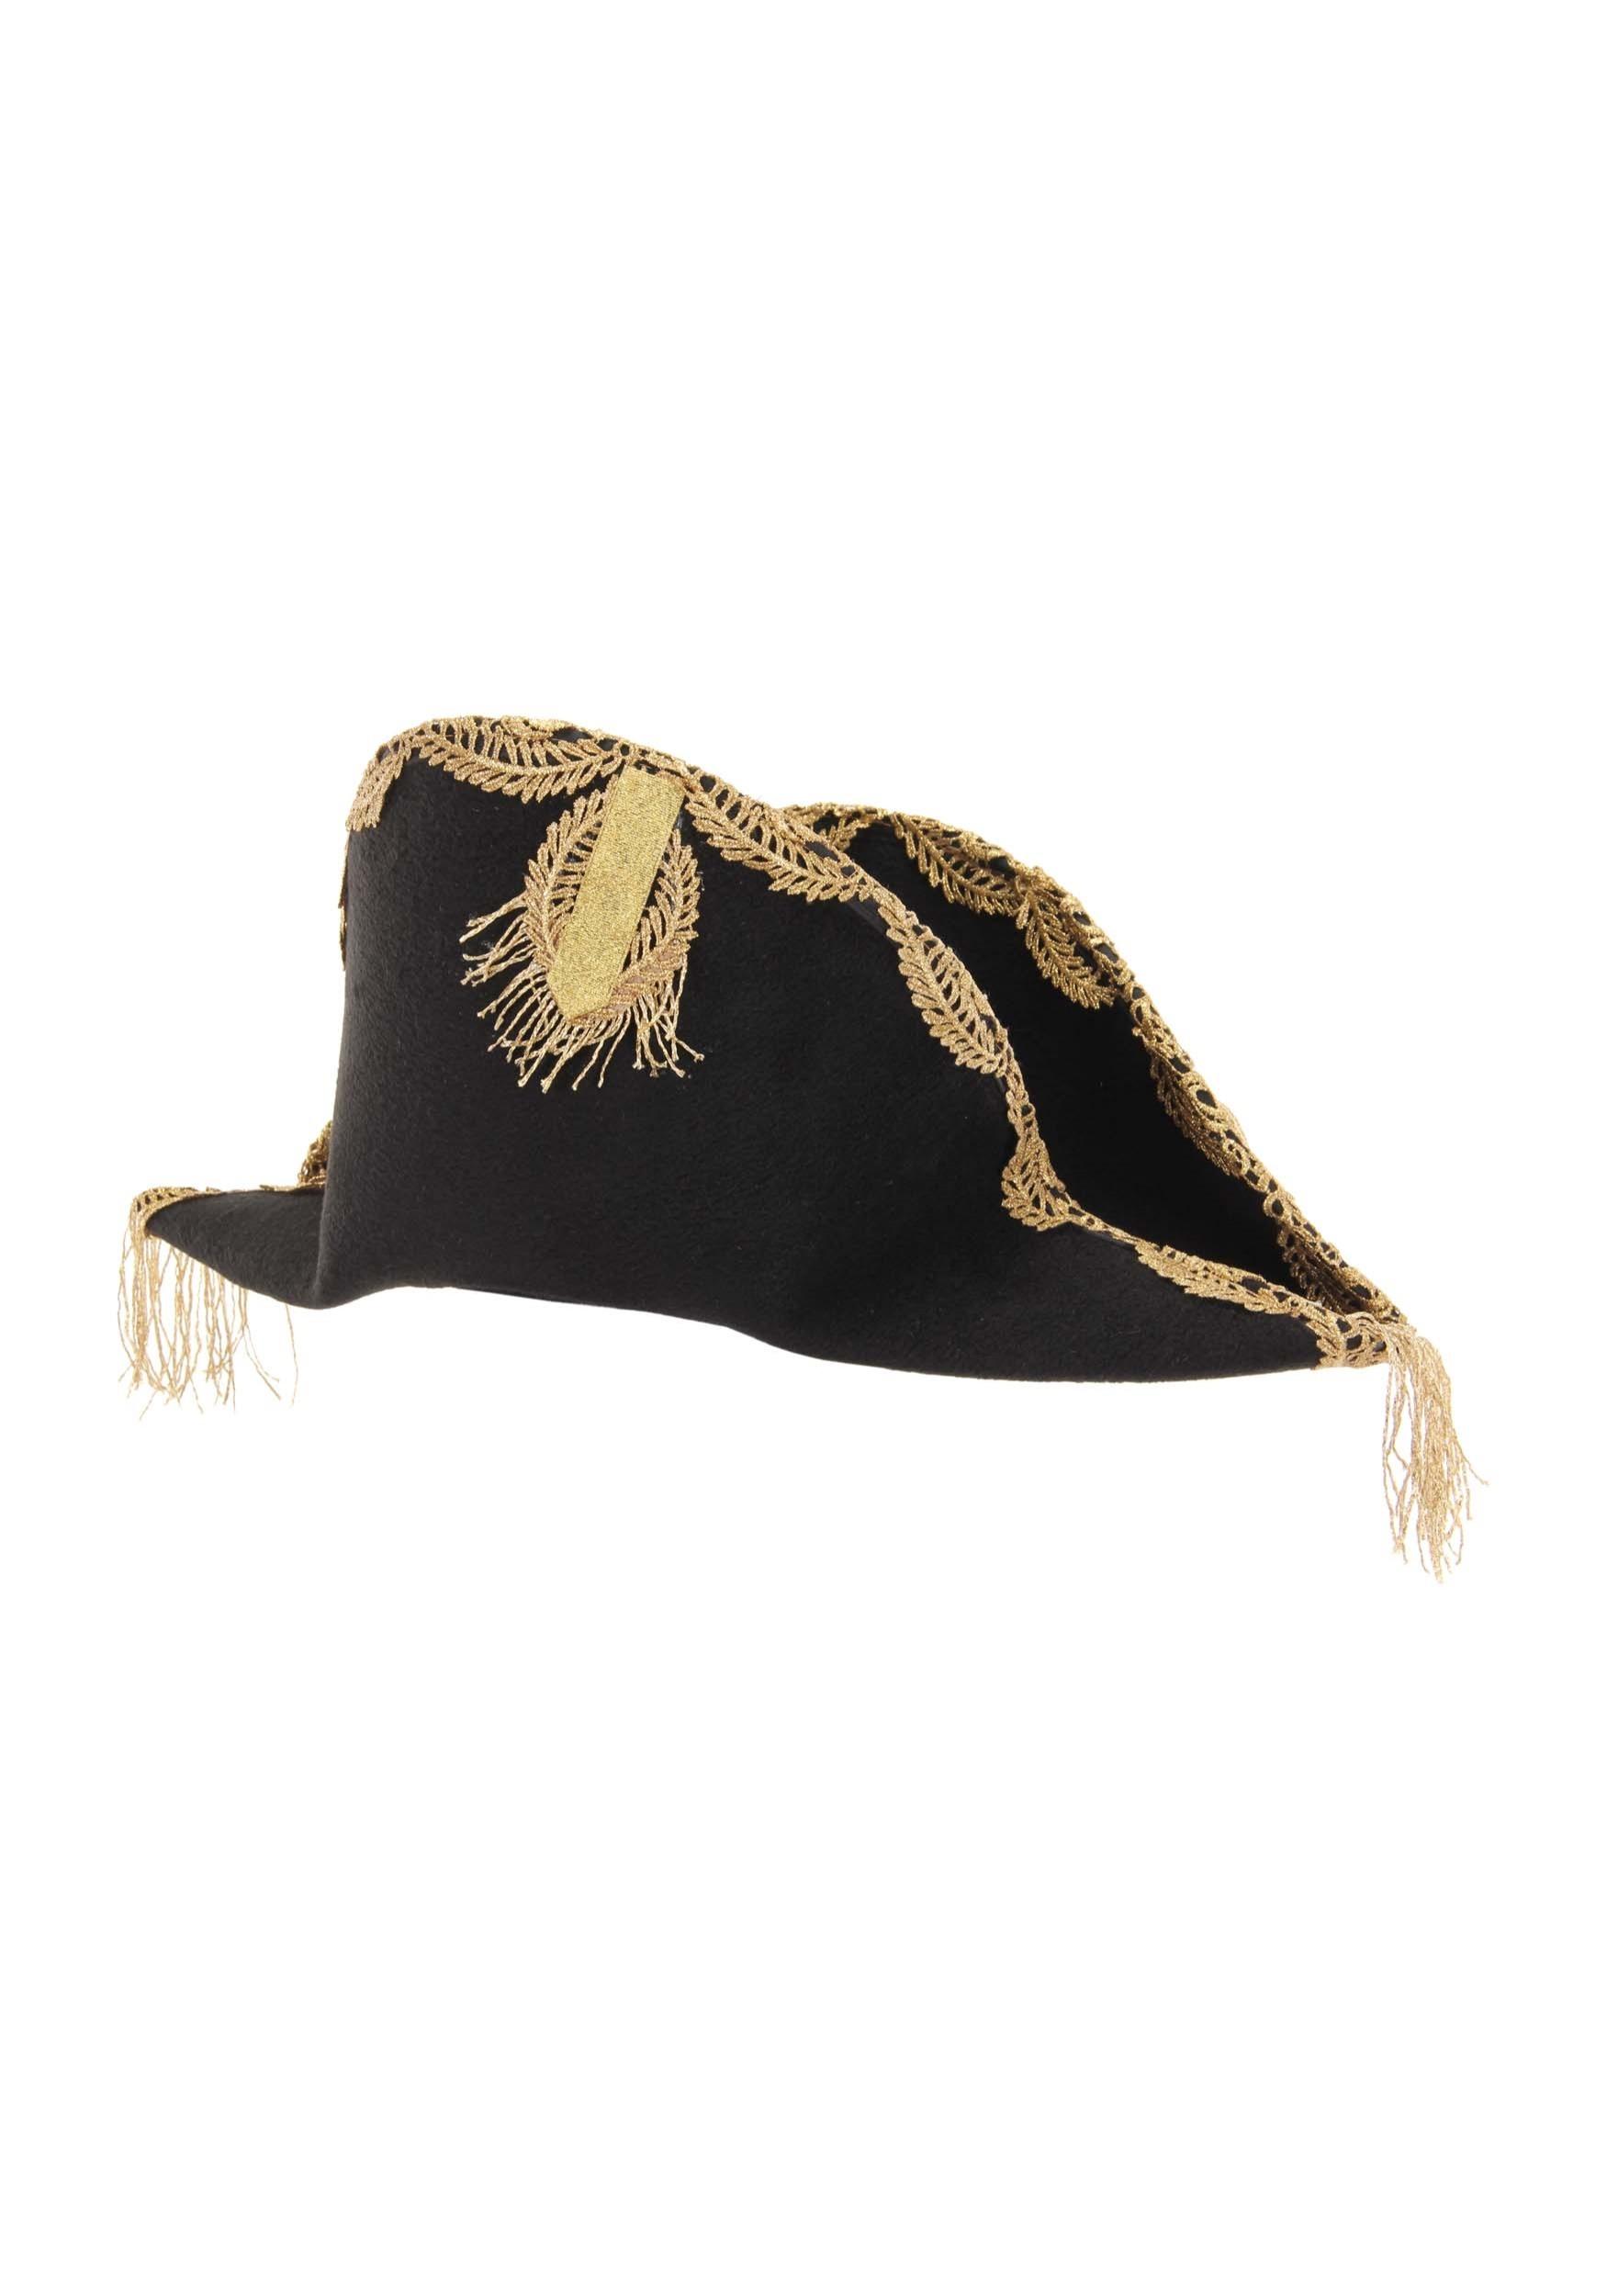 cfc284e2b747f Barbossa Adult Pirate Hat Barbossa Adult Pirate Hat